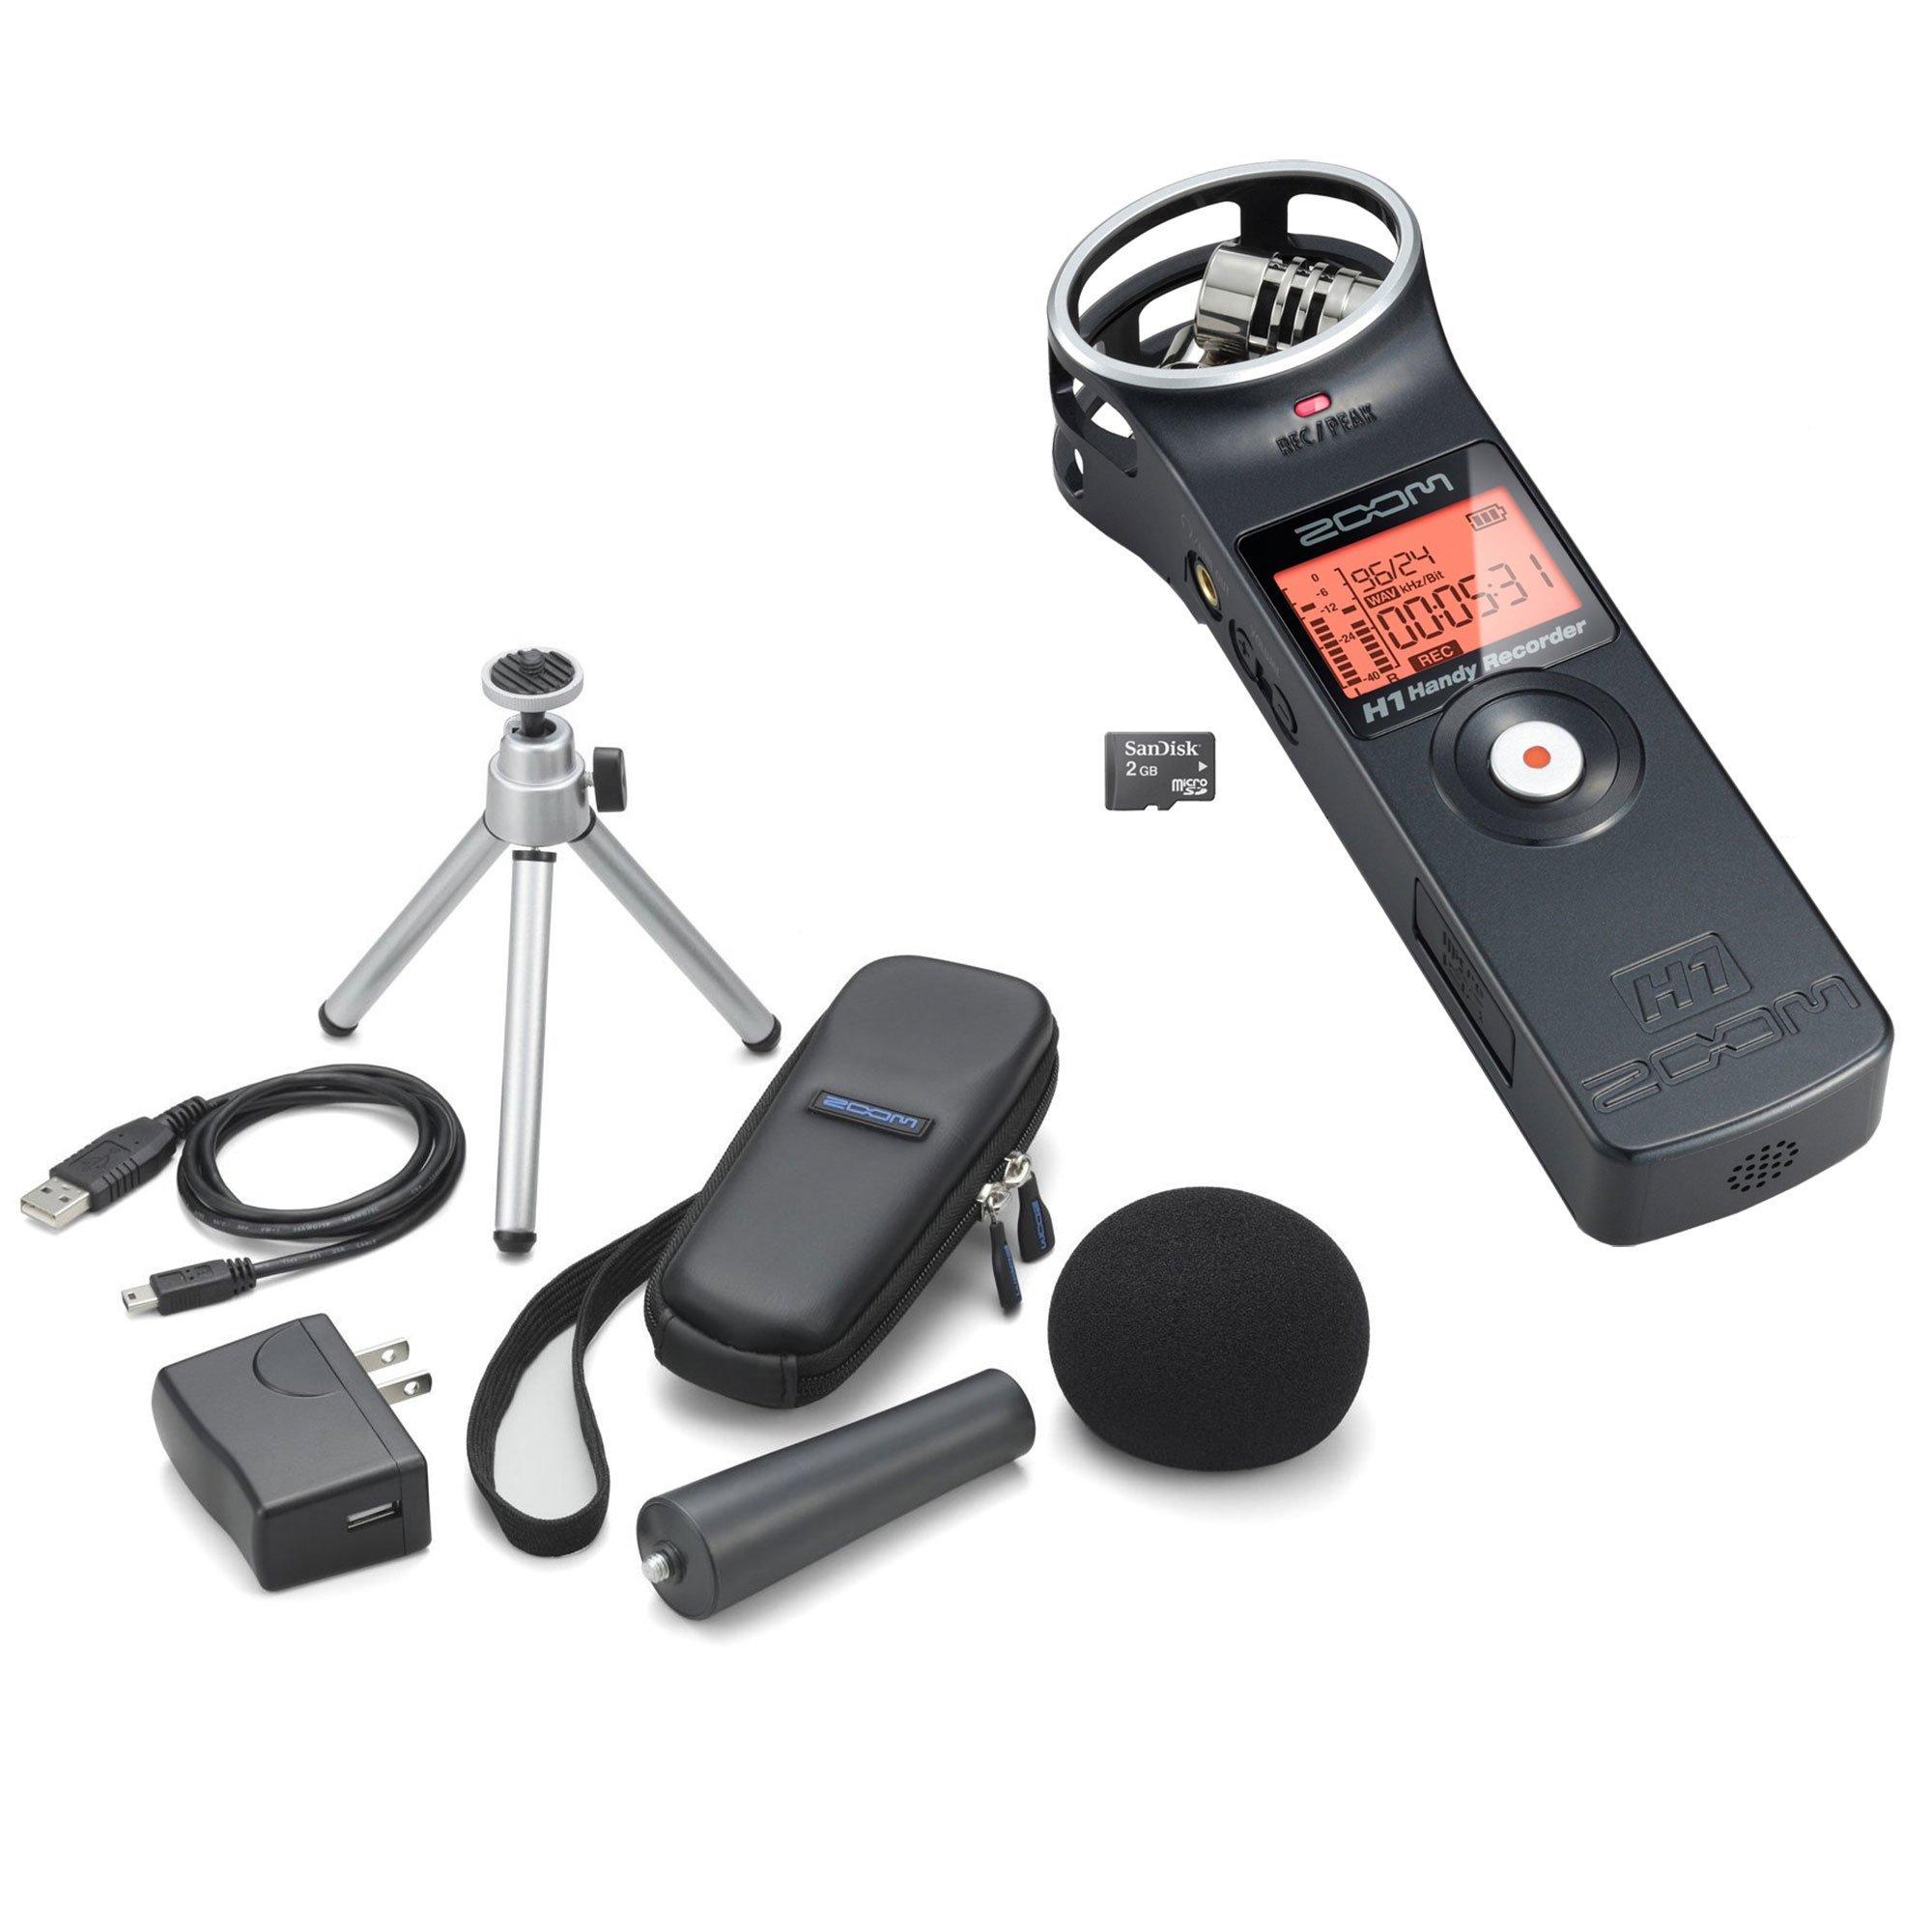 Zoom H1 Handy Recorder Plus Accessory Kit